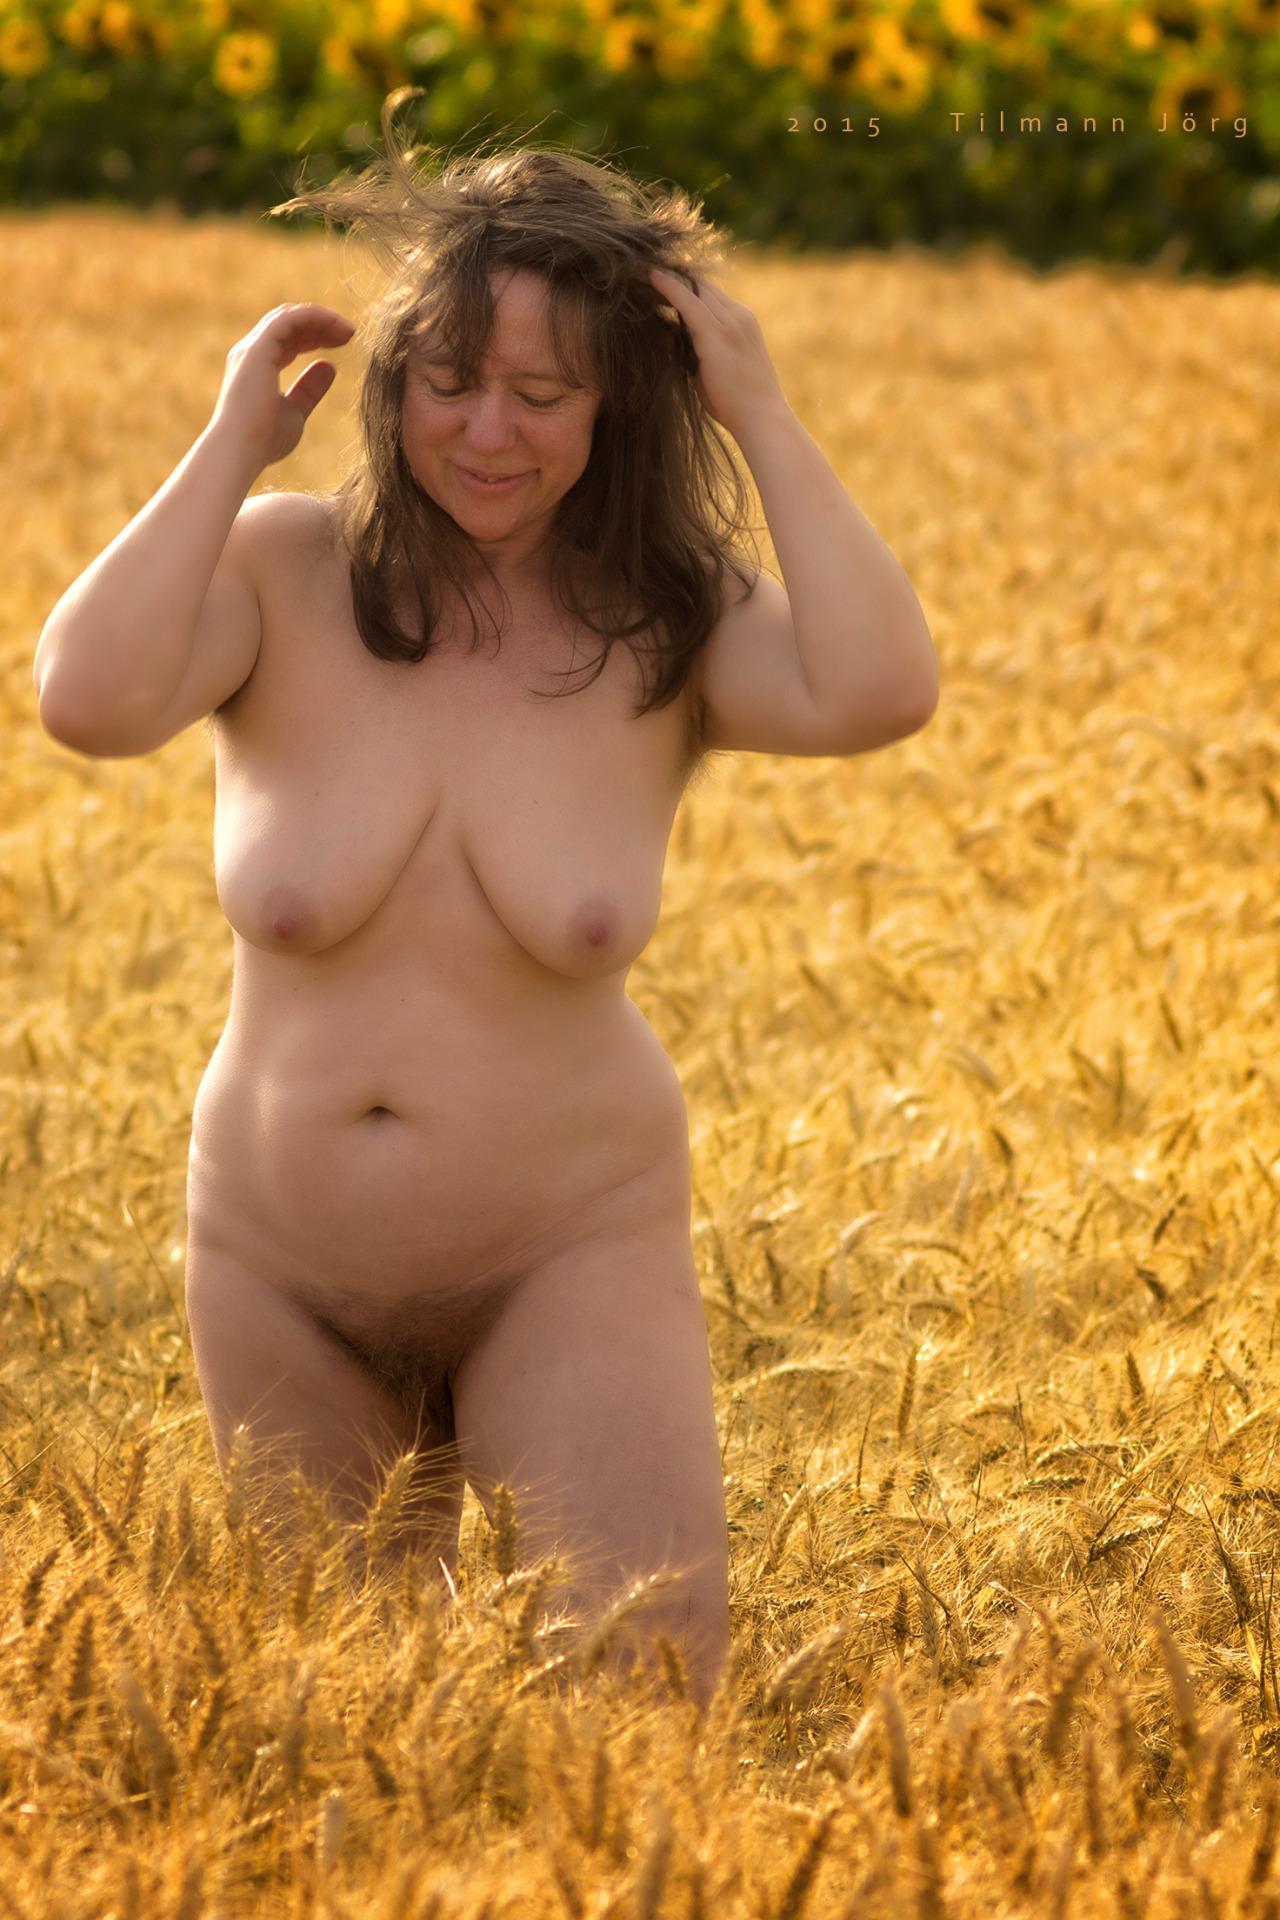 Nackte Frau im Getreidefeld